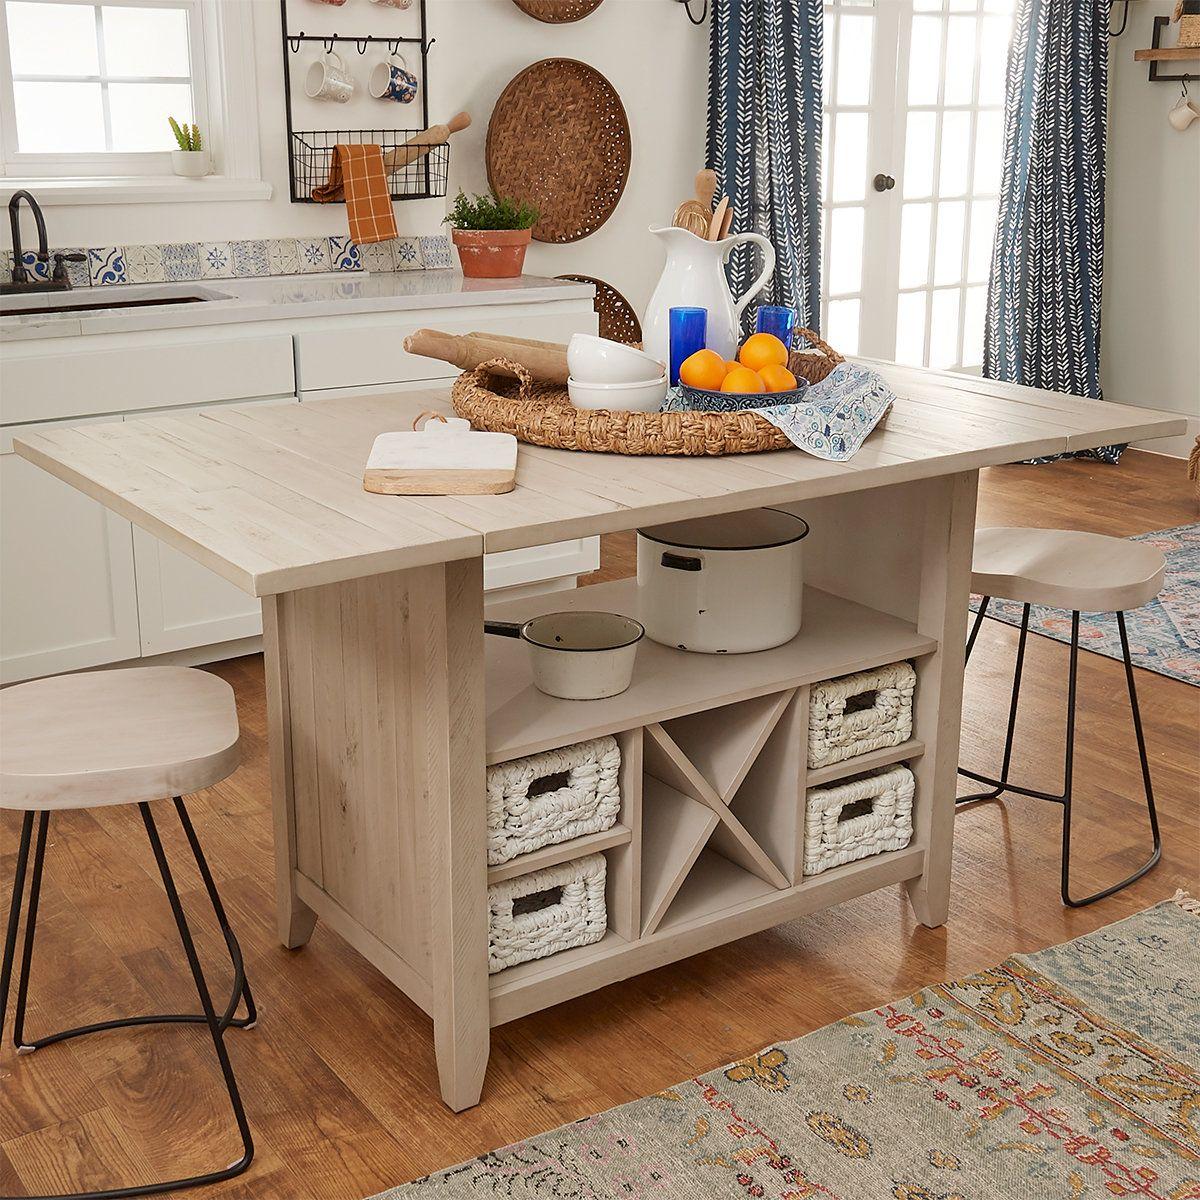 Crosley Drop Leaf Kitchen Island Kitchen Island Furniture Apartment Kitchen Island Kitchen Island Dining Table